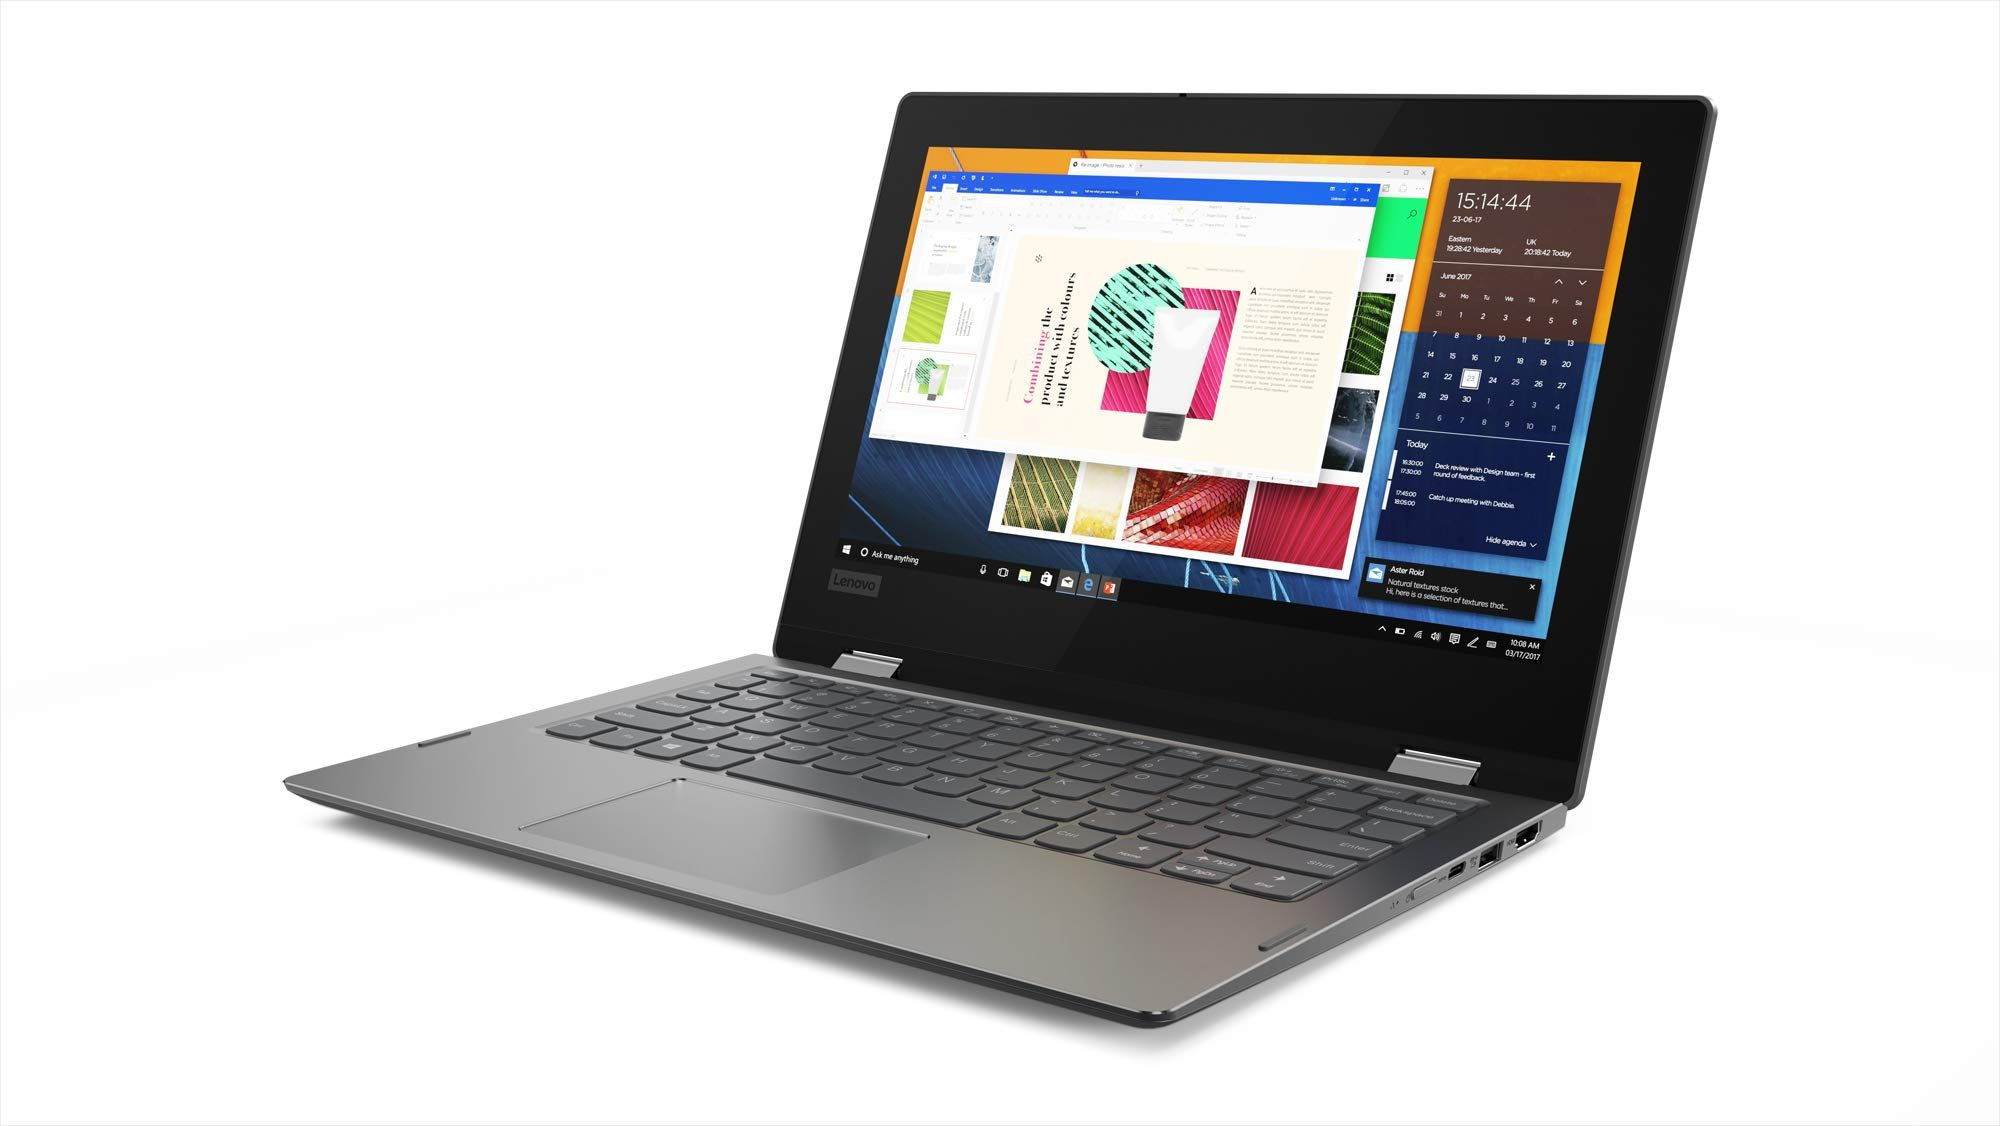 Amazon Com Lenovo Flex 11 2 In 1 Convertible Laptop 11 6 Inch Hd Touchscreen Display Intel Pentium Silver N5000 Processor 4 Mini Laptop Best Laptops Lenovo